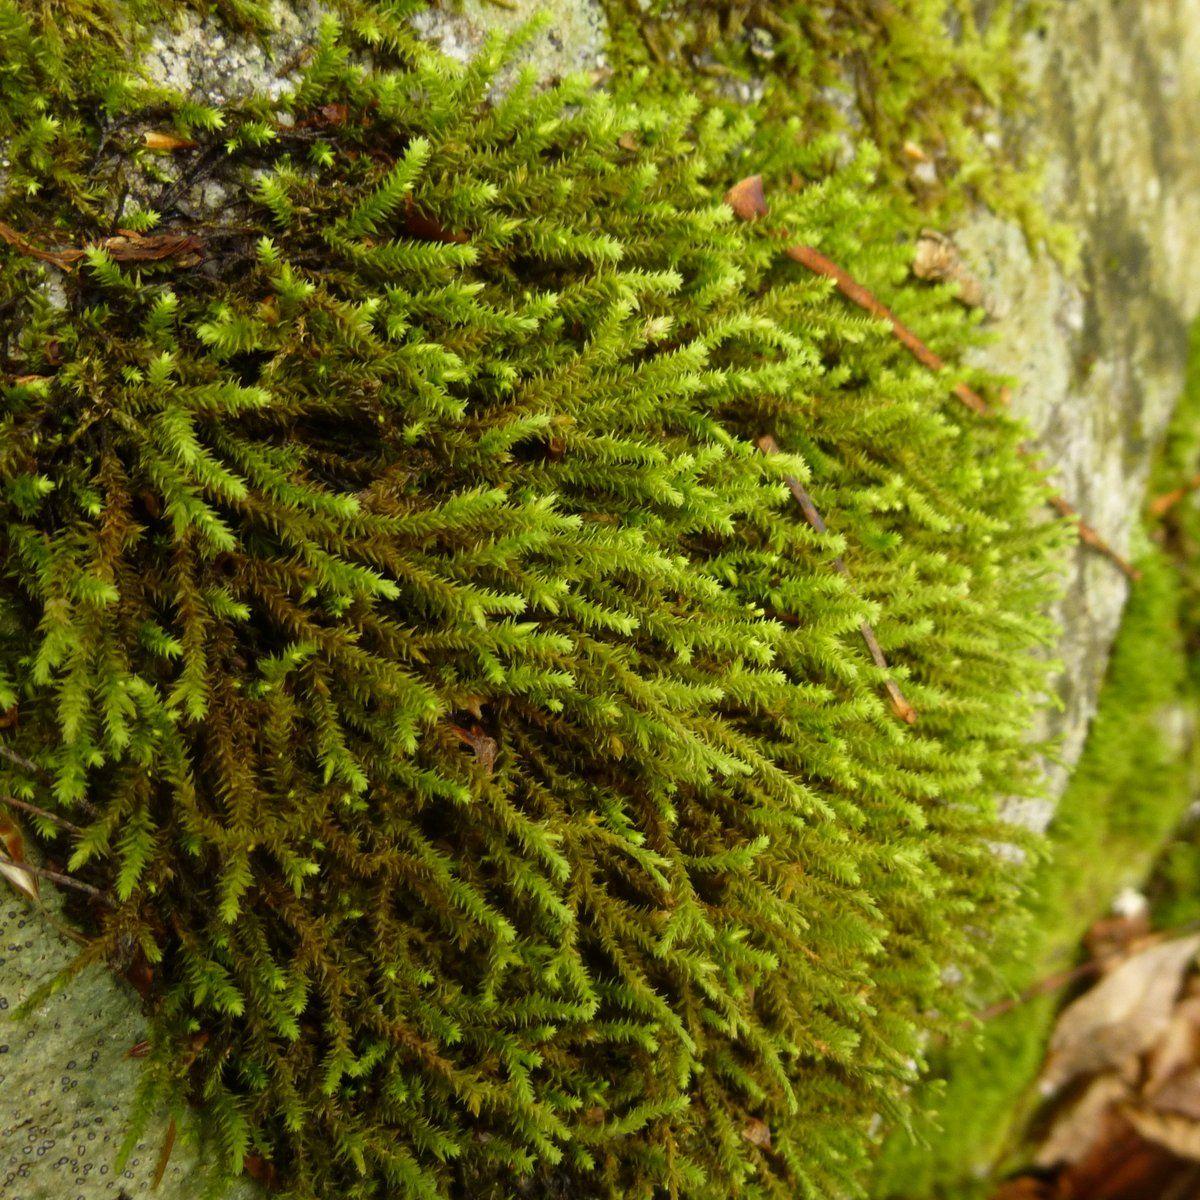 Pin On Garden. Plants -- Bryophyte... Moss